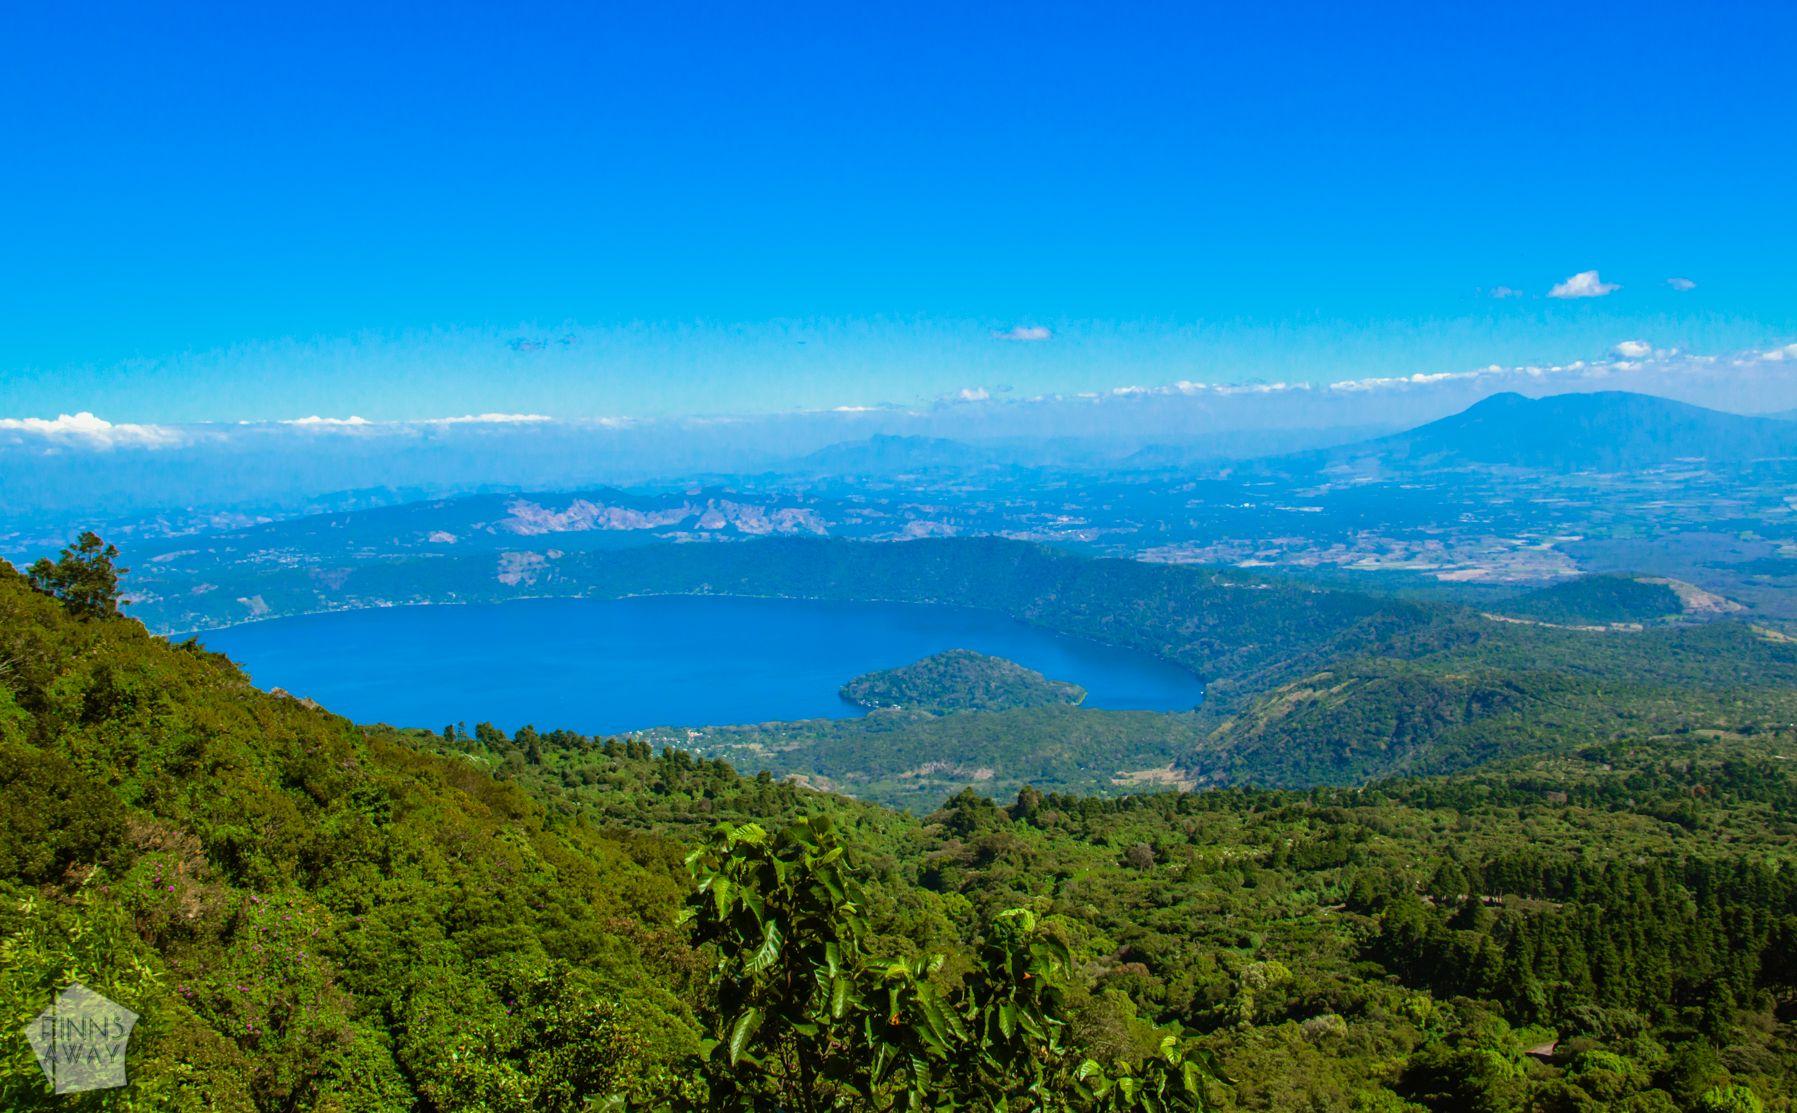 Coatepeque Lake | Hiking Santa Ana Volcano in El Salvador | FinnsAway Travel Blog